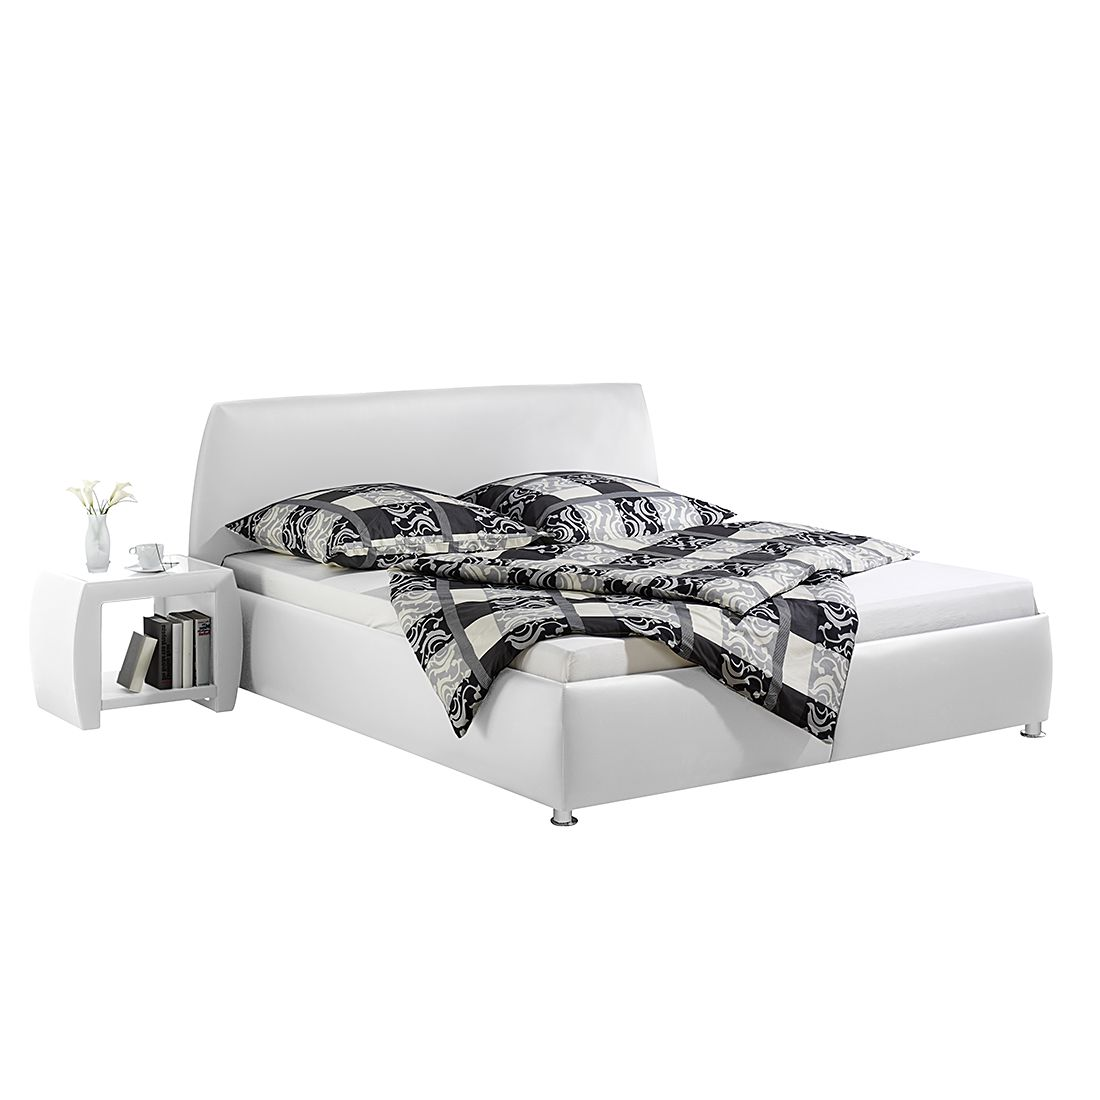 Polsterbett Mio Kunstleder - 160 x 200cm - Bettgestell ohne Matratze & Lattenrost - Weiß, Monaco